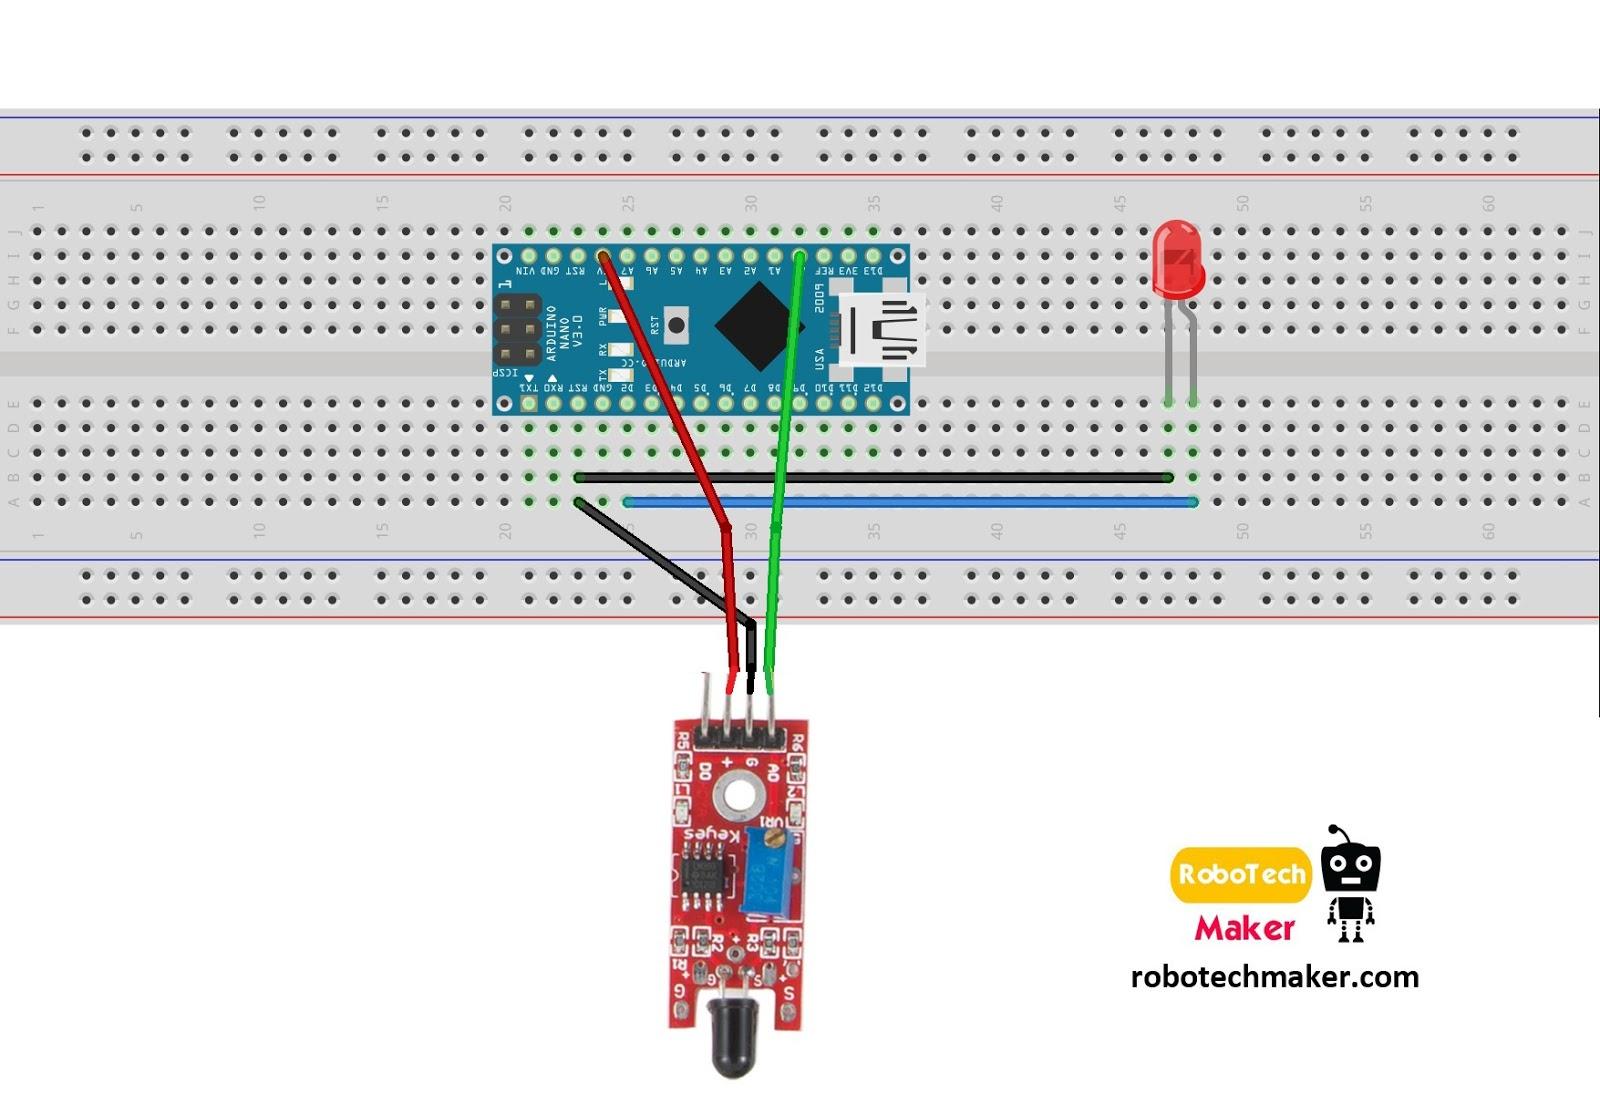 robotech maker how to use flame sensor simple tutorial rh robotechmaker com Garage Door Safety Sensor Diagram 5 Wire Oxygen Sensor Diagram